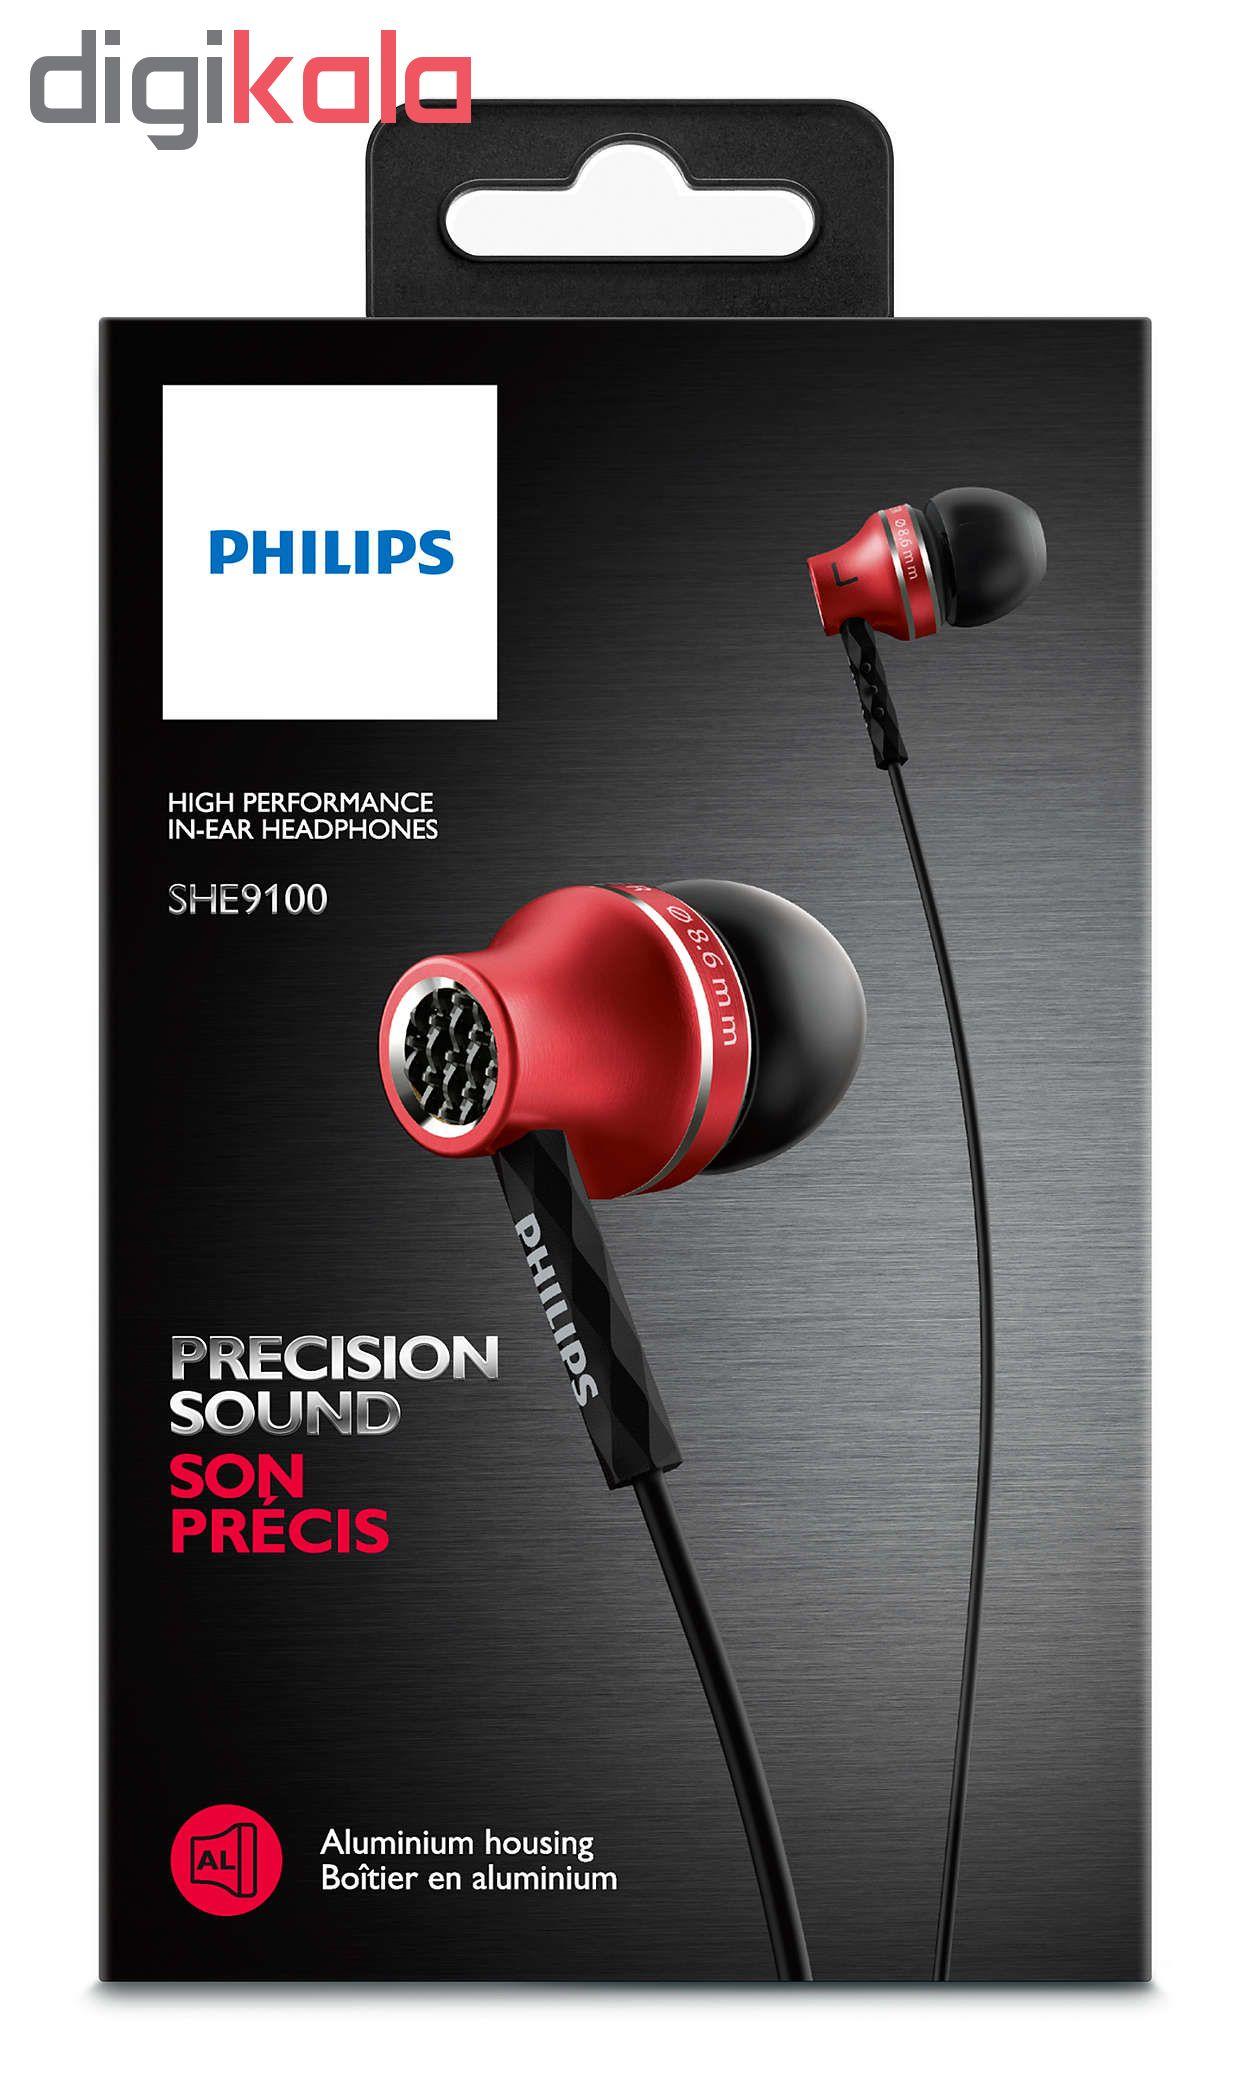 هدفون فیلیپس مدل SHE 9100